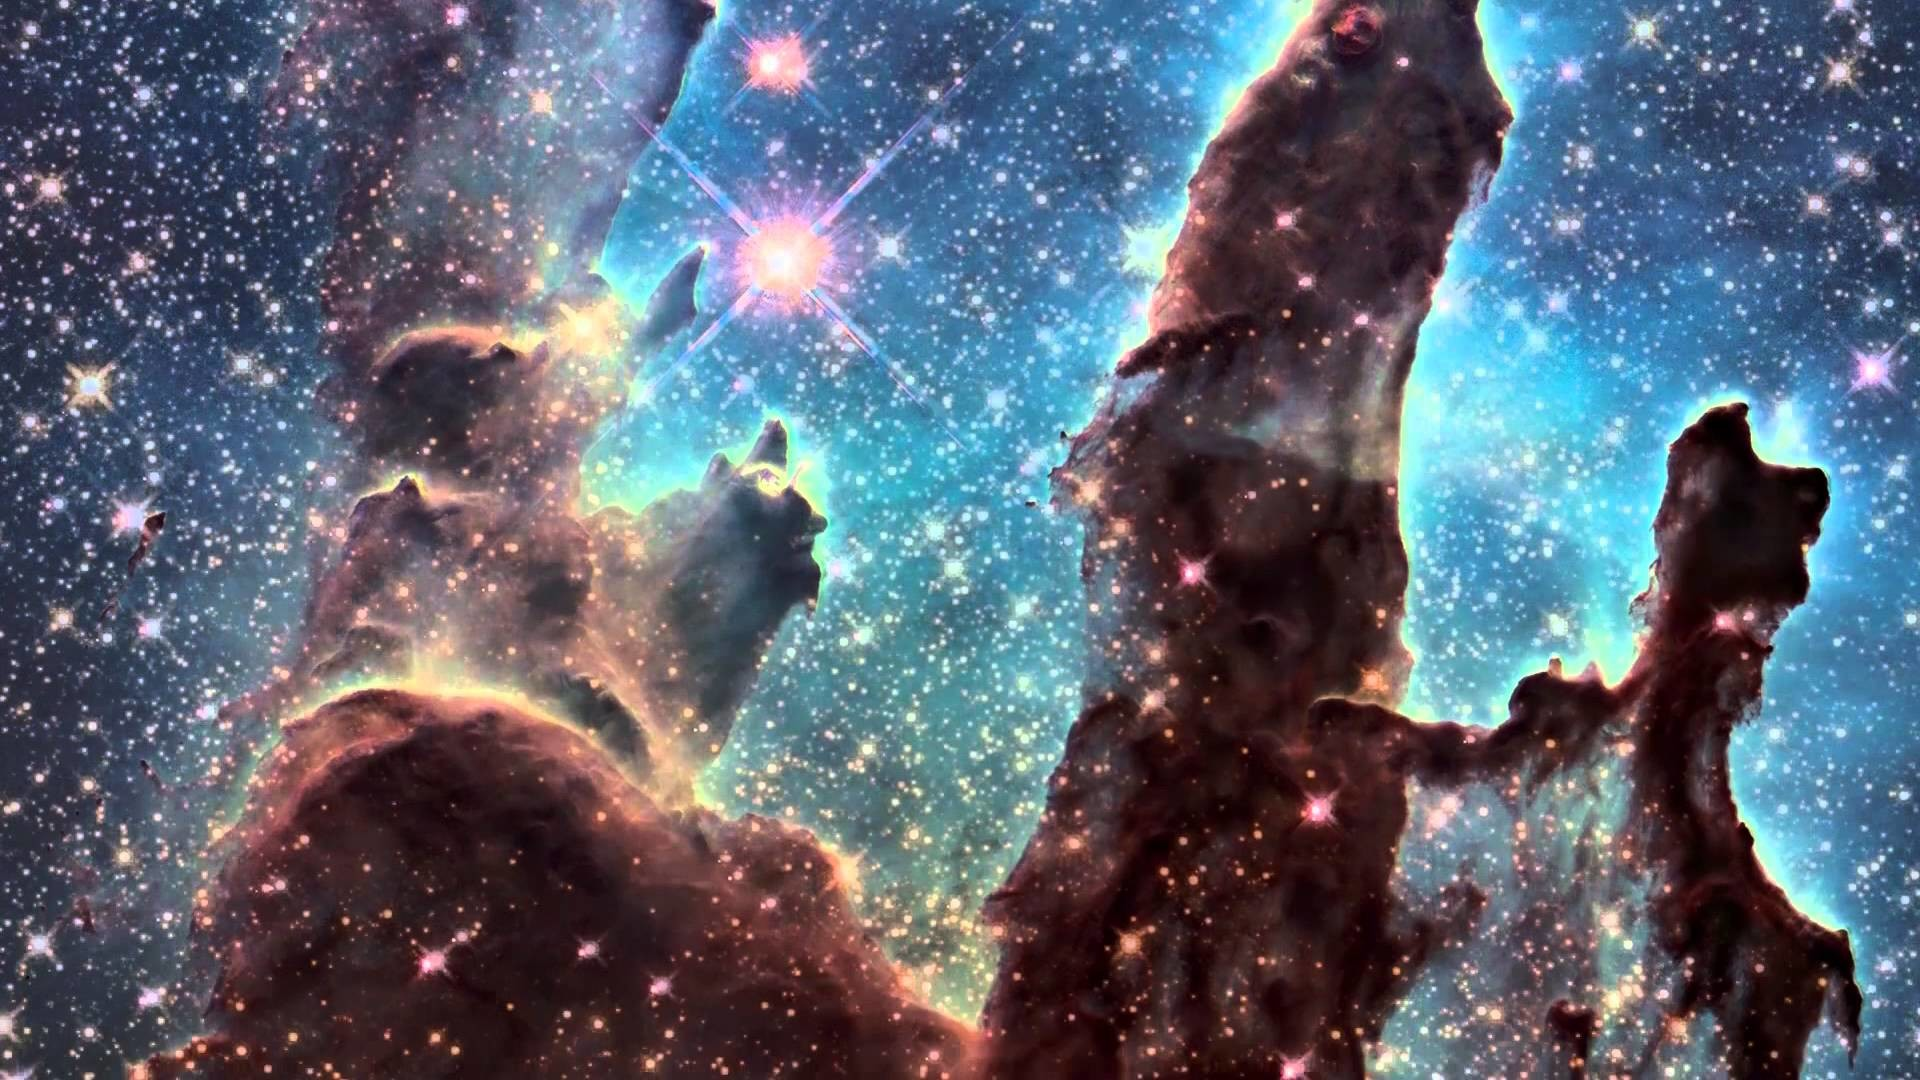 Hubble wallpaper 1080p 63 images - Pillars of creation wallpaper ...